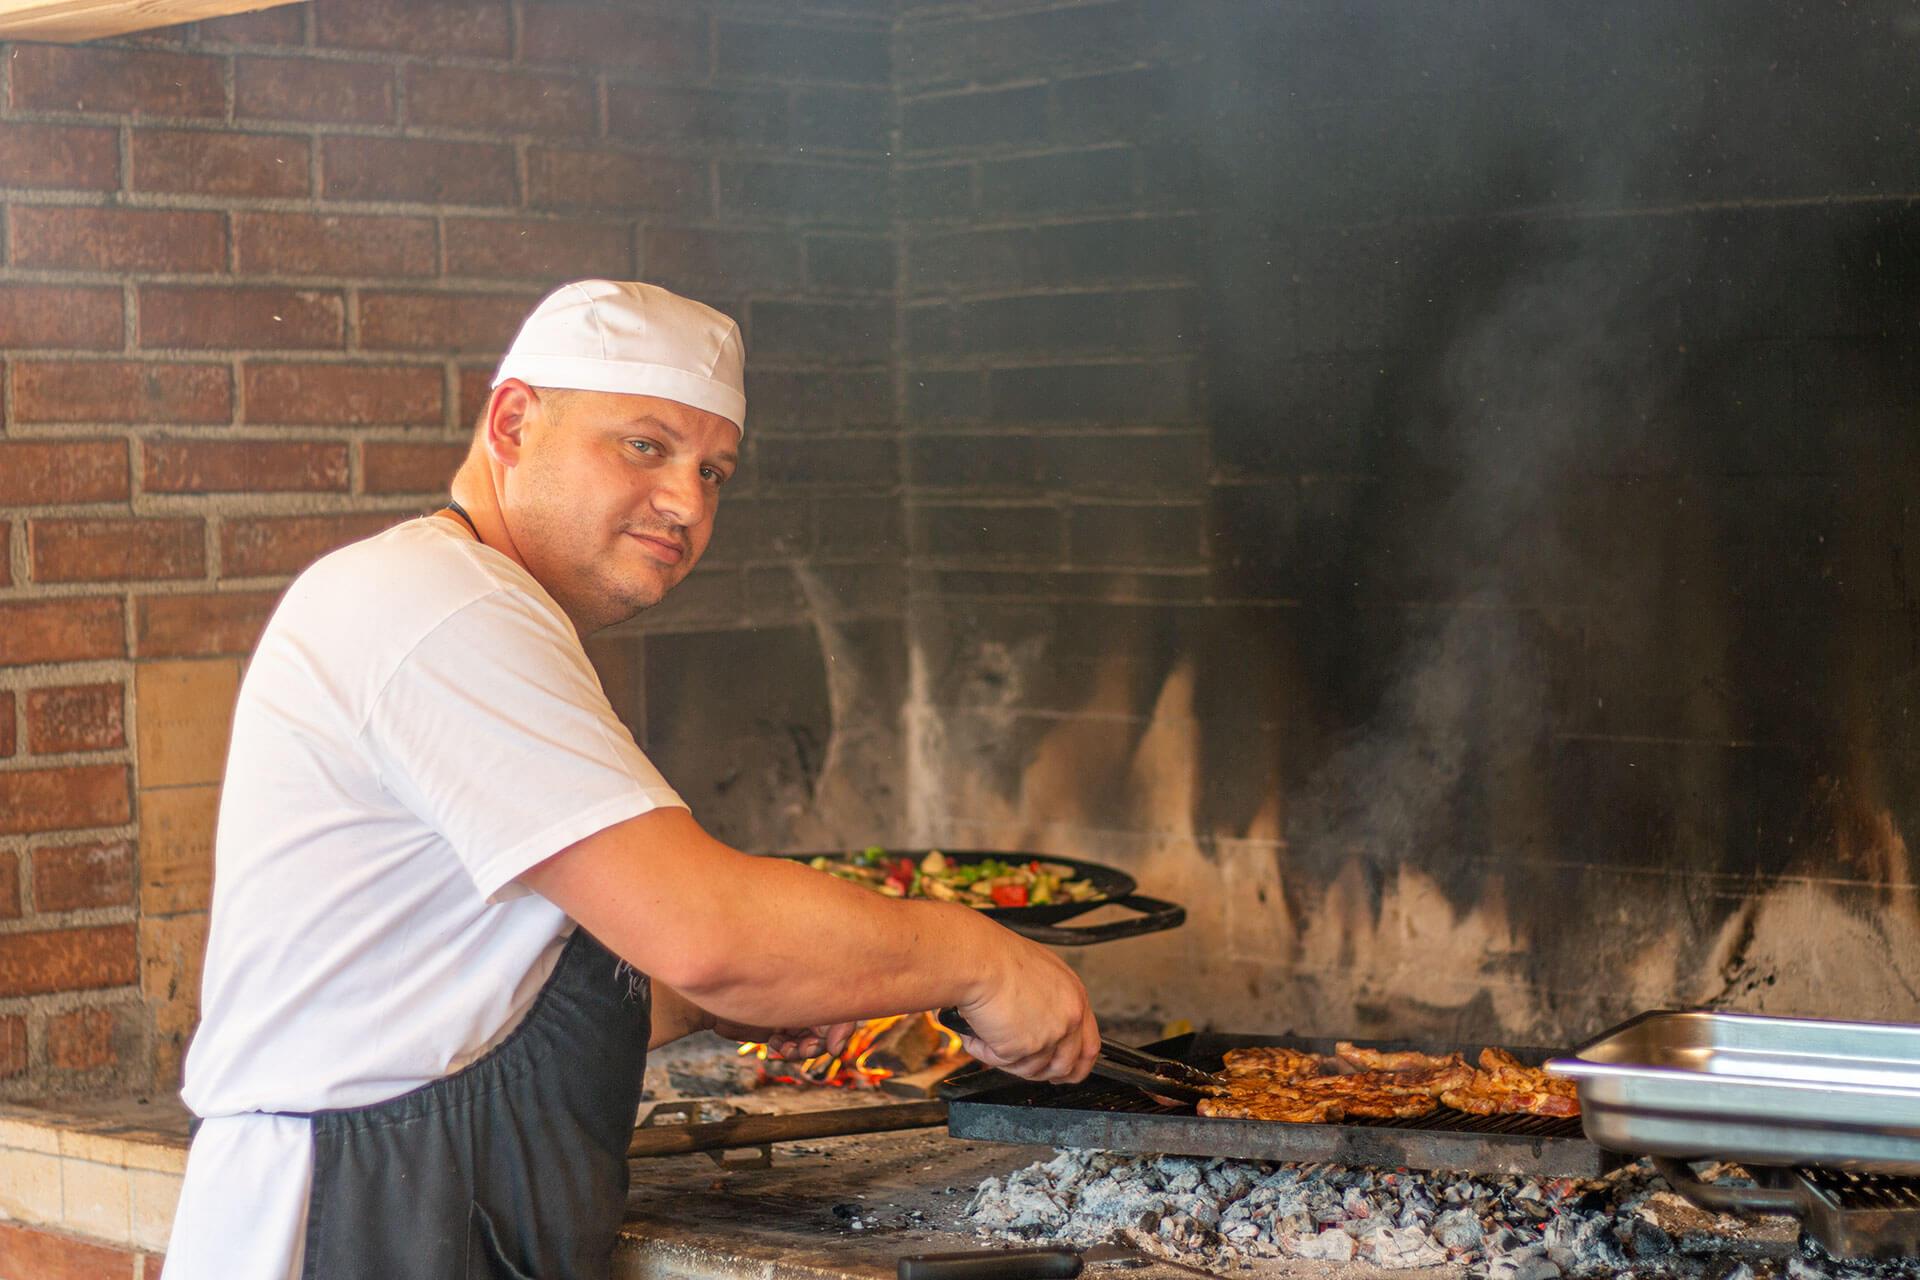 slovenia-eco-resort-kulinarika-16.jpg